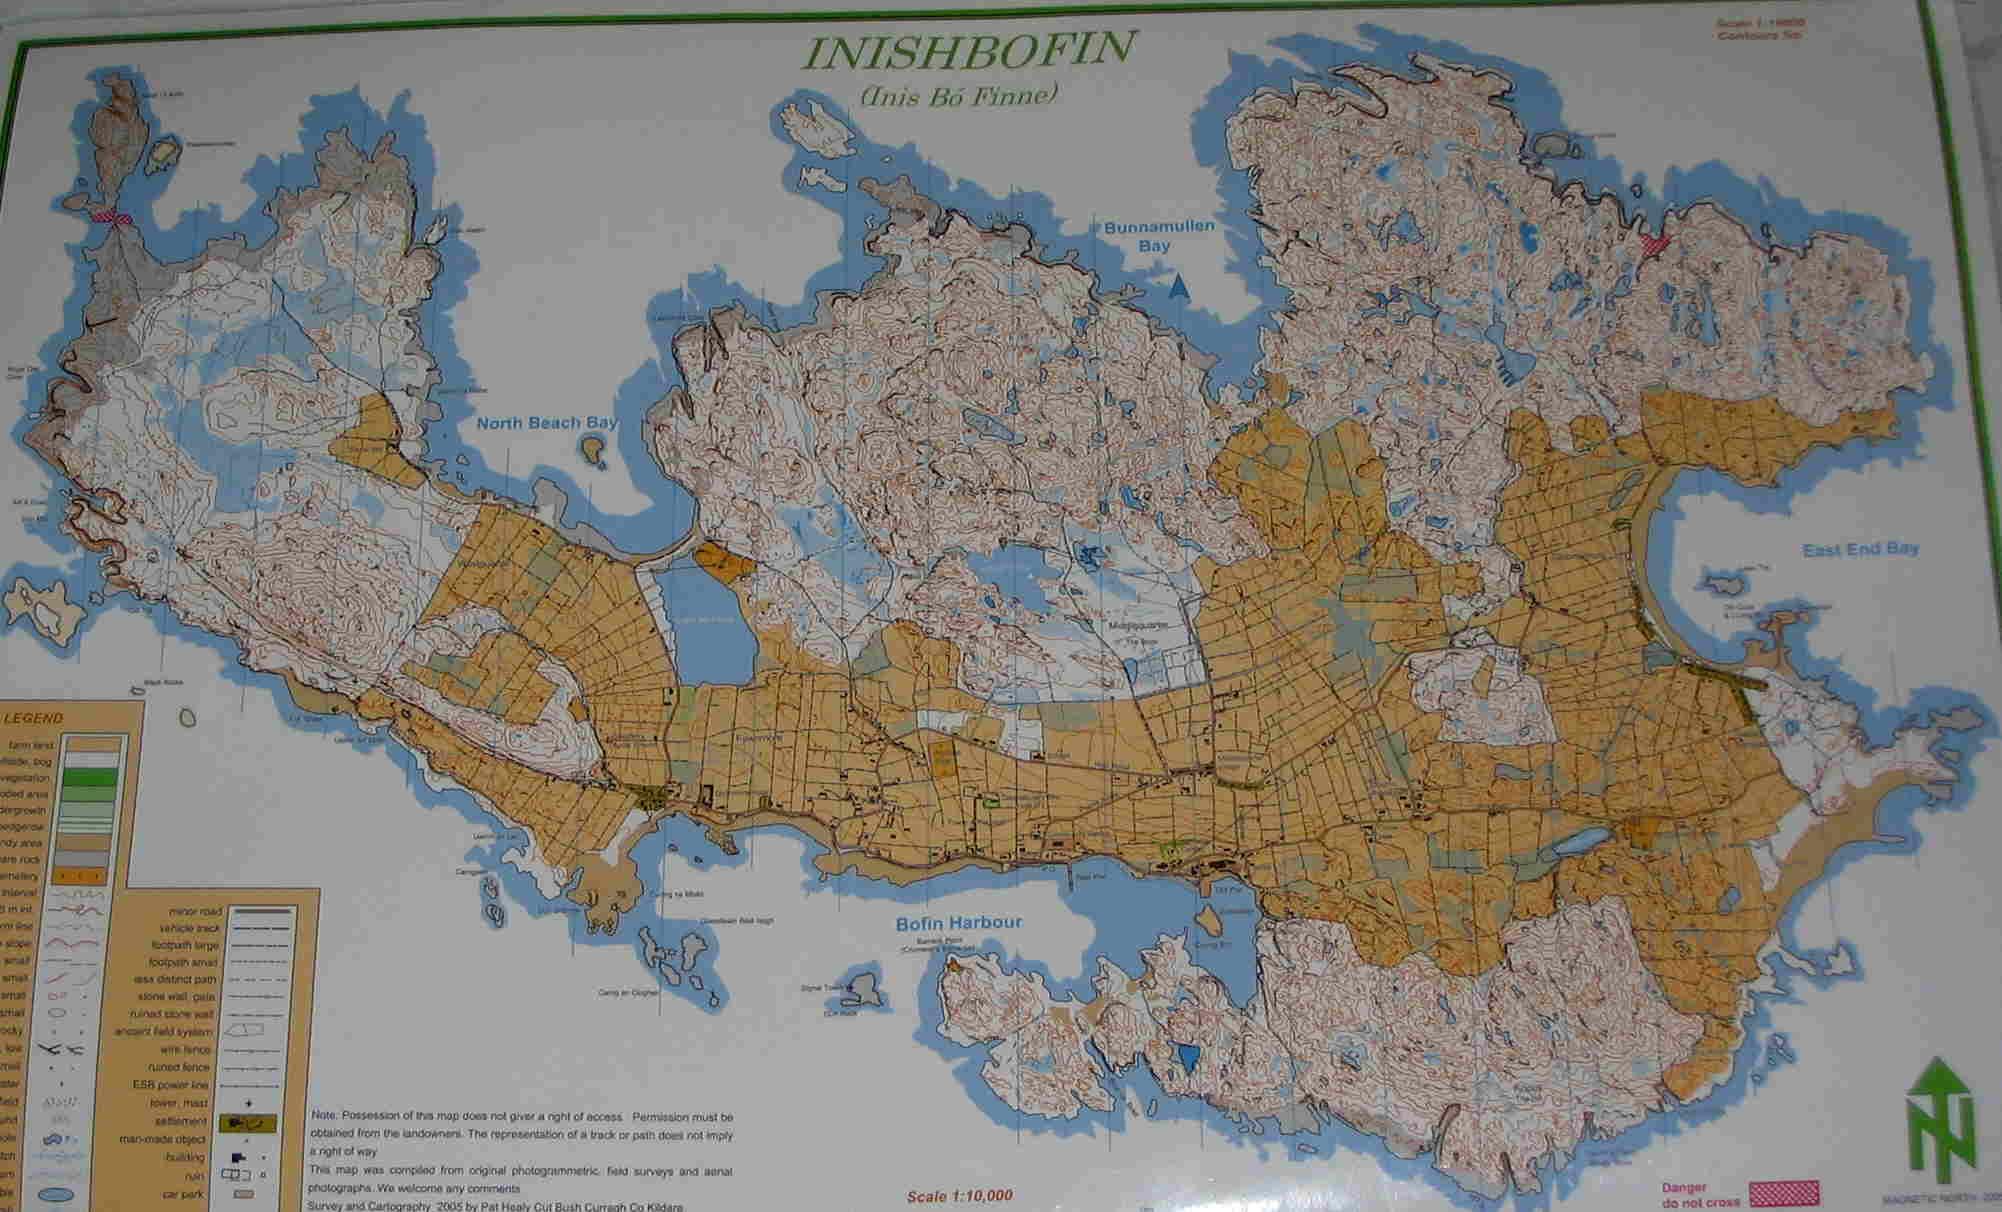 Inishbofin orienteering maps